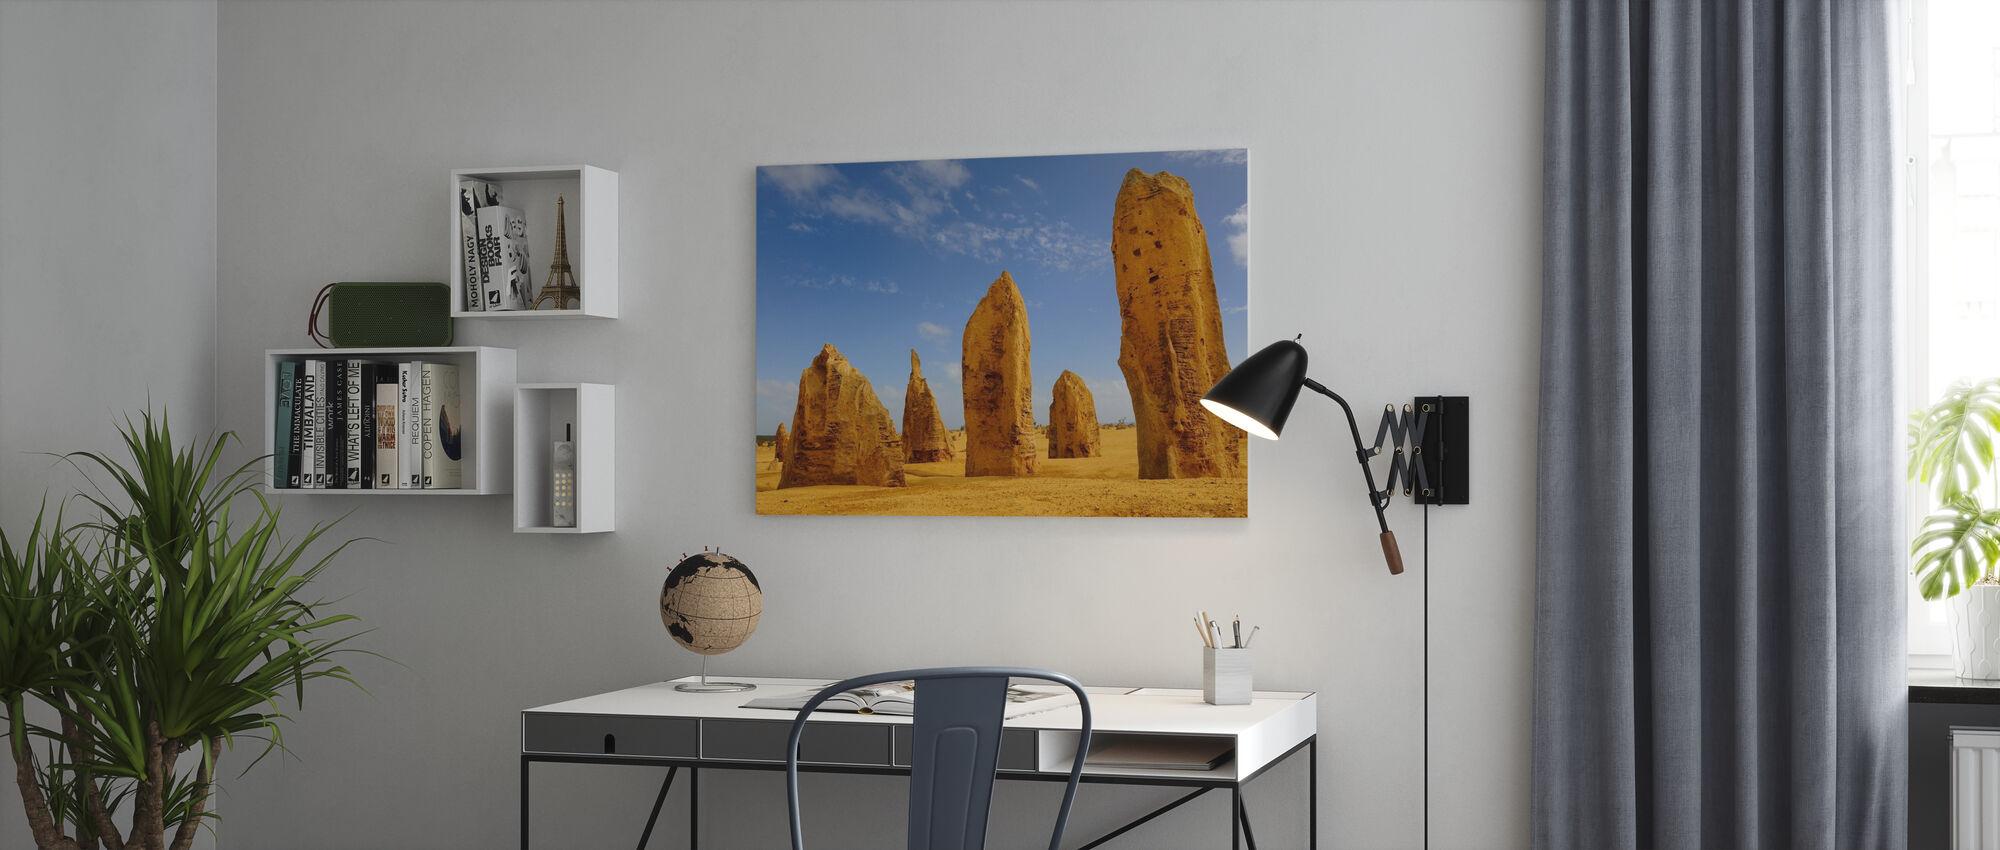 Limestone Formations II - Canvas print - Office